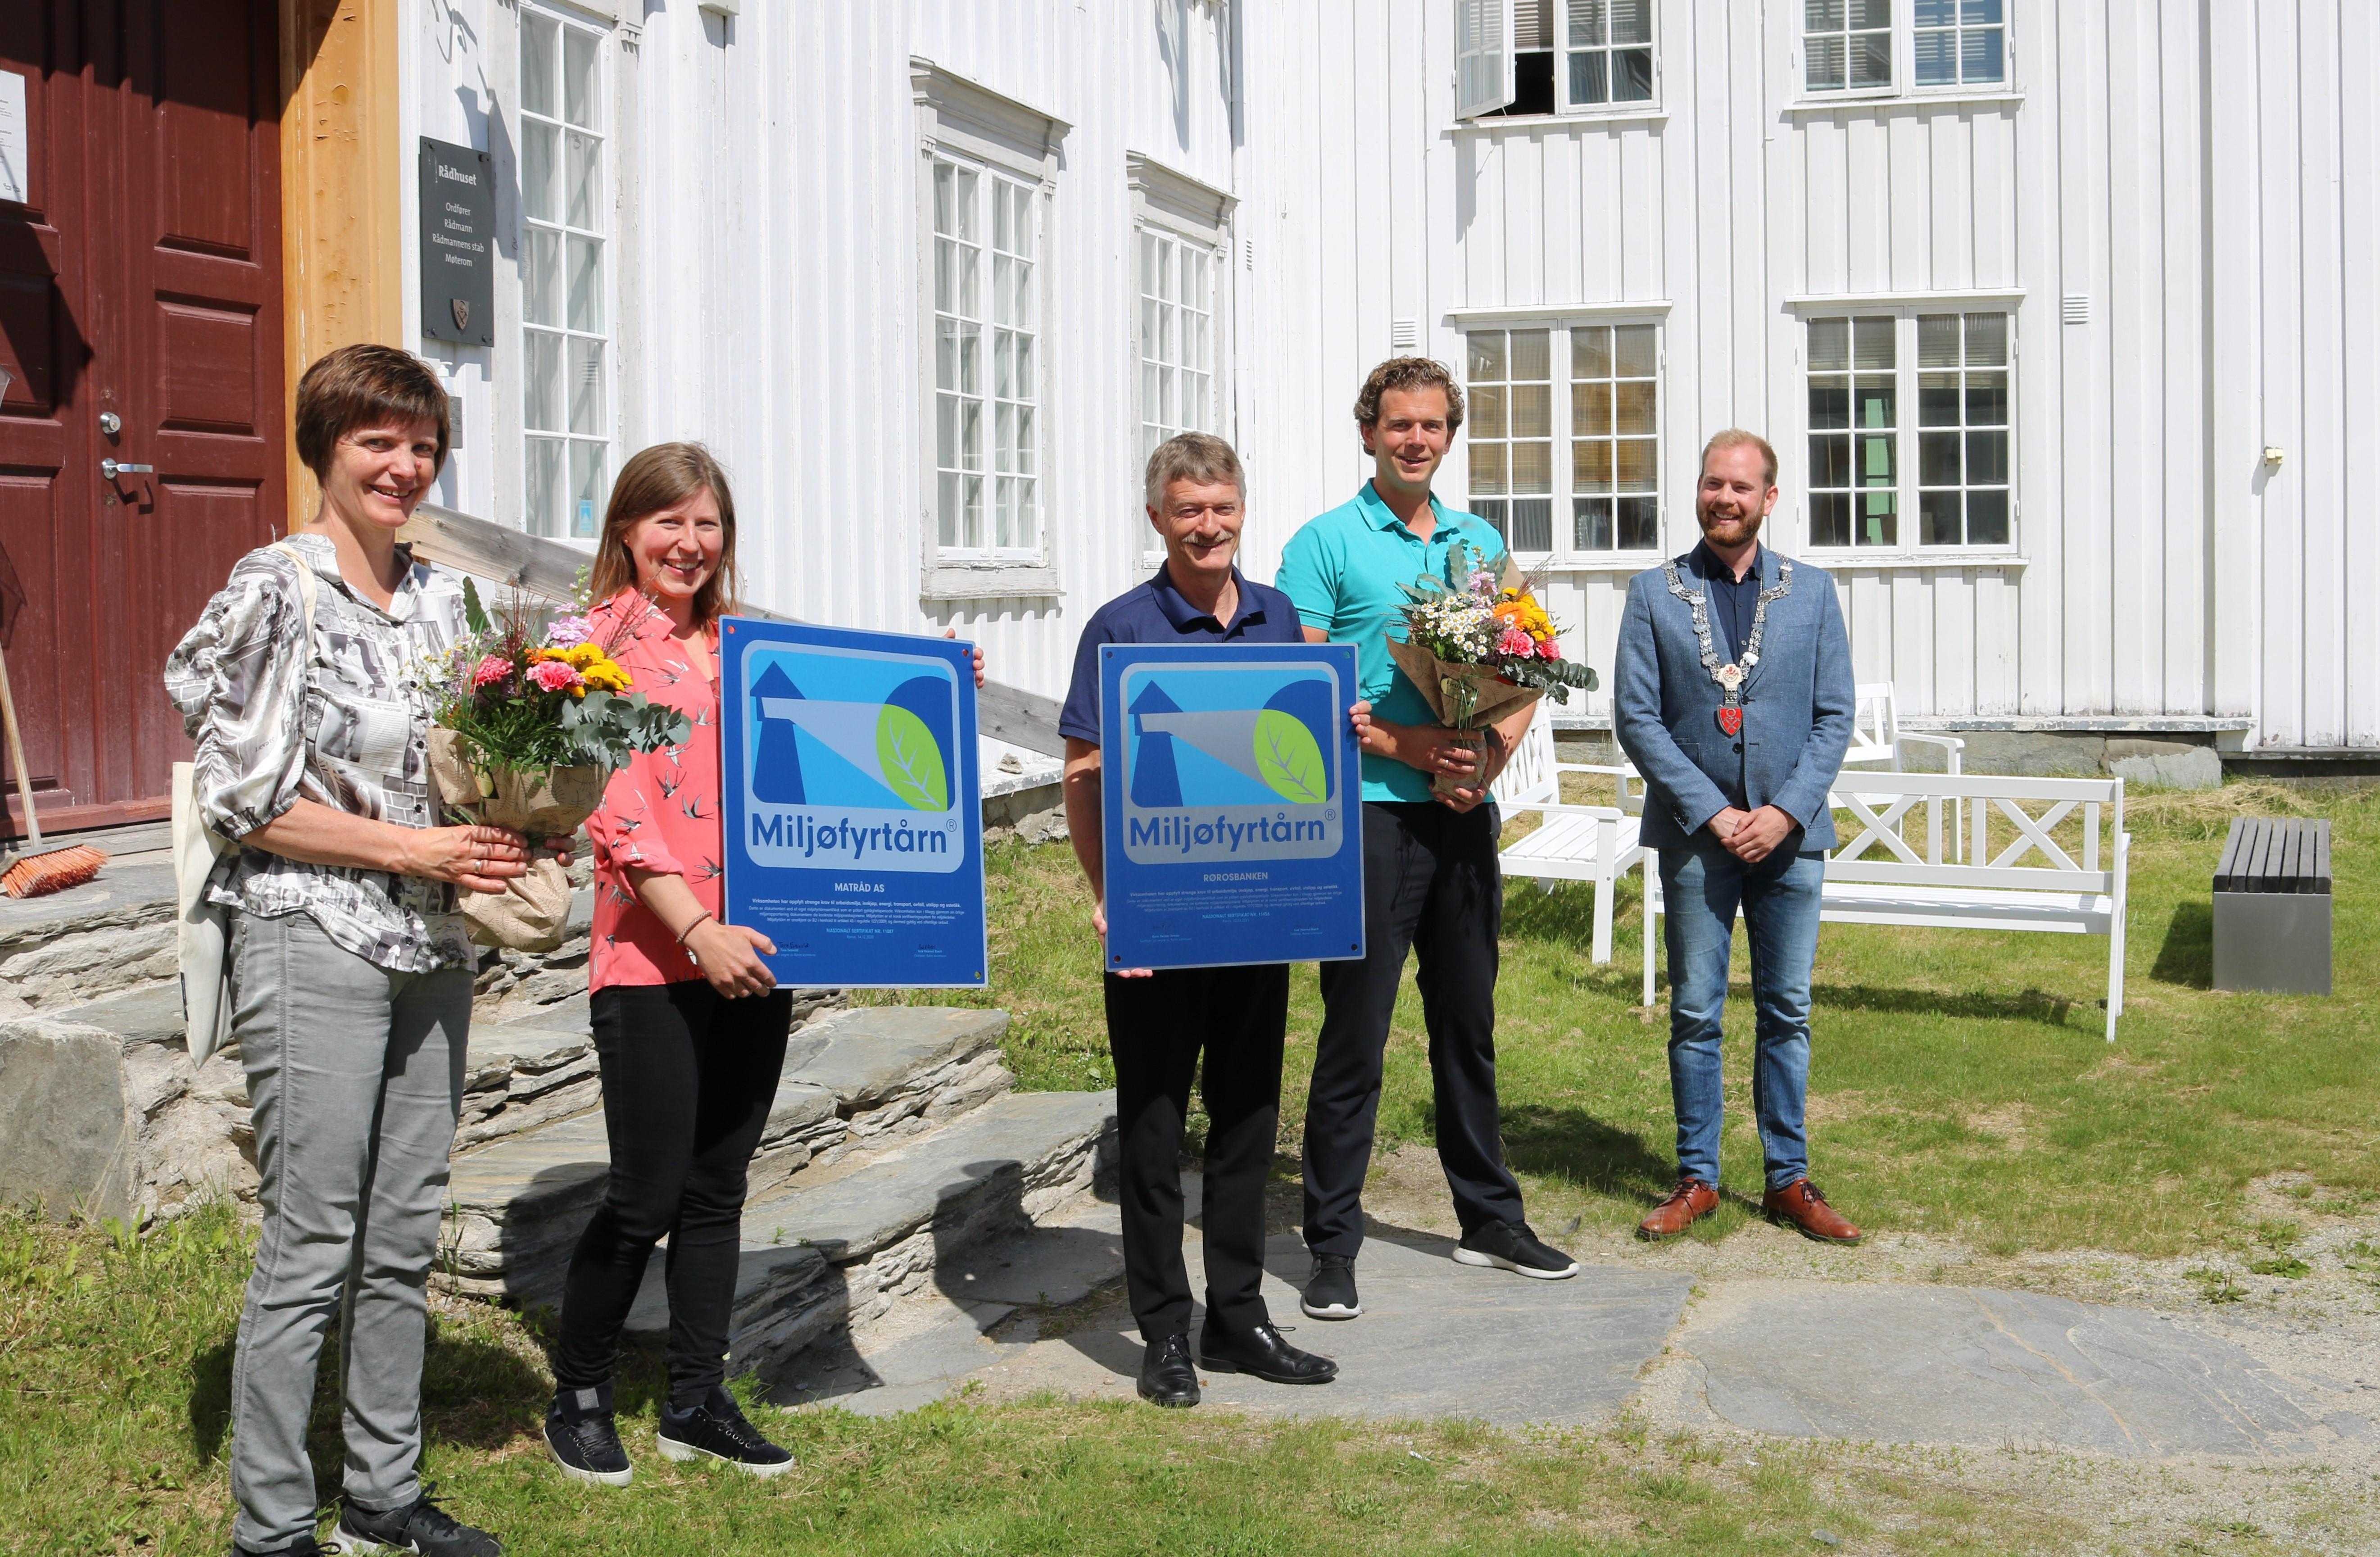 Rørosbanken og Matråd er sertifisert som miljøfyrtårn